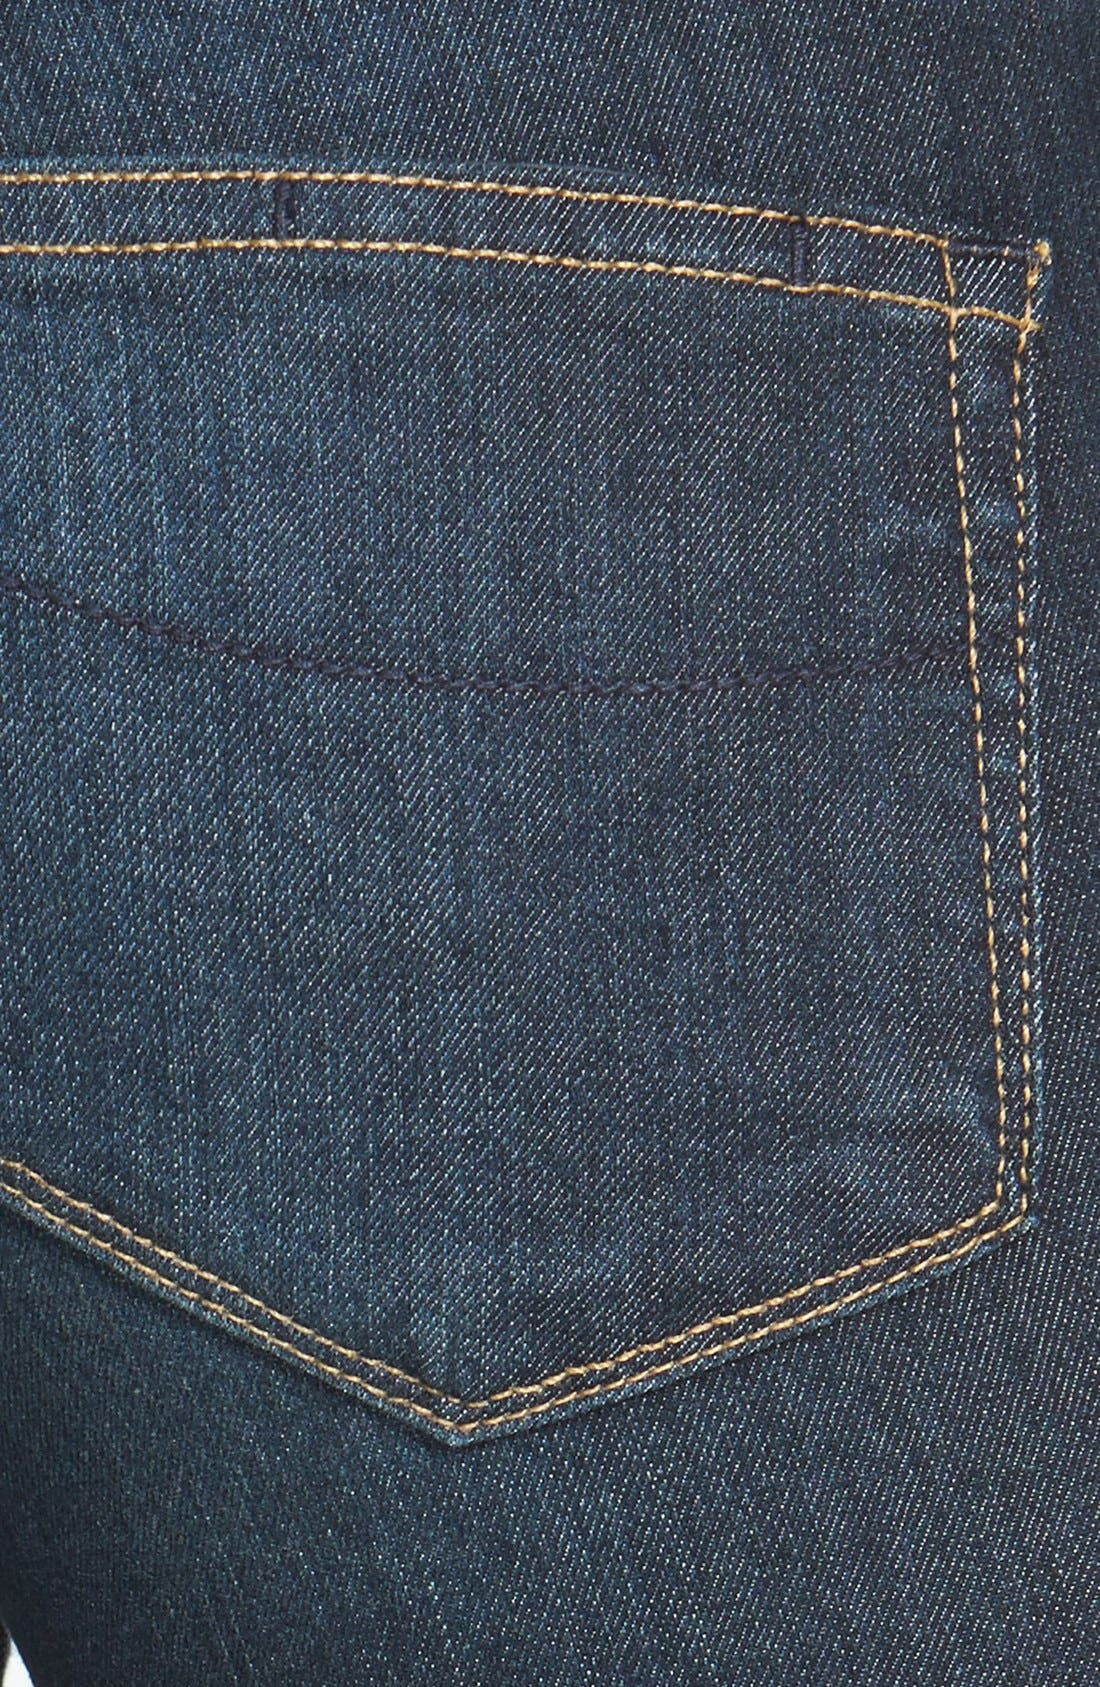 Alternate Image 3  - Paige Denim 'Manhattan' Bootcut Jeans (Moonrise)